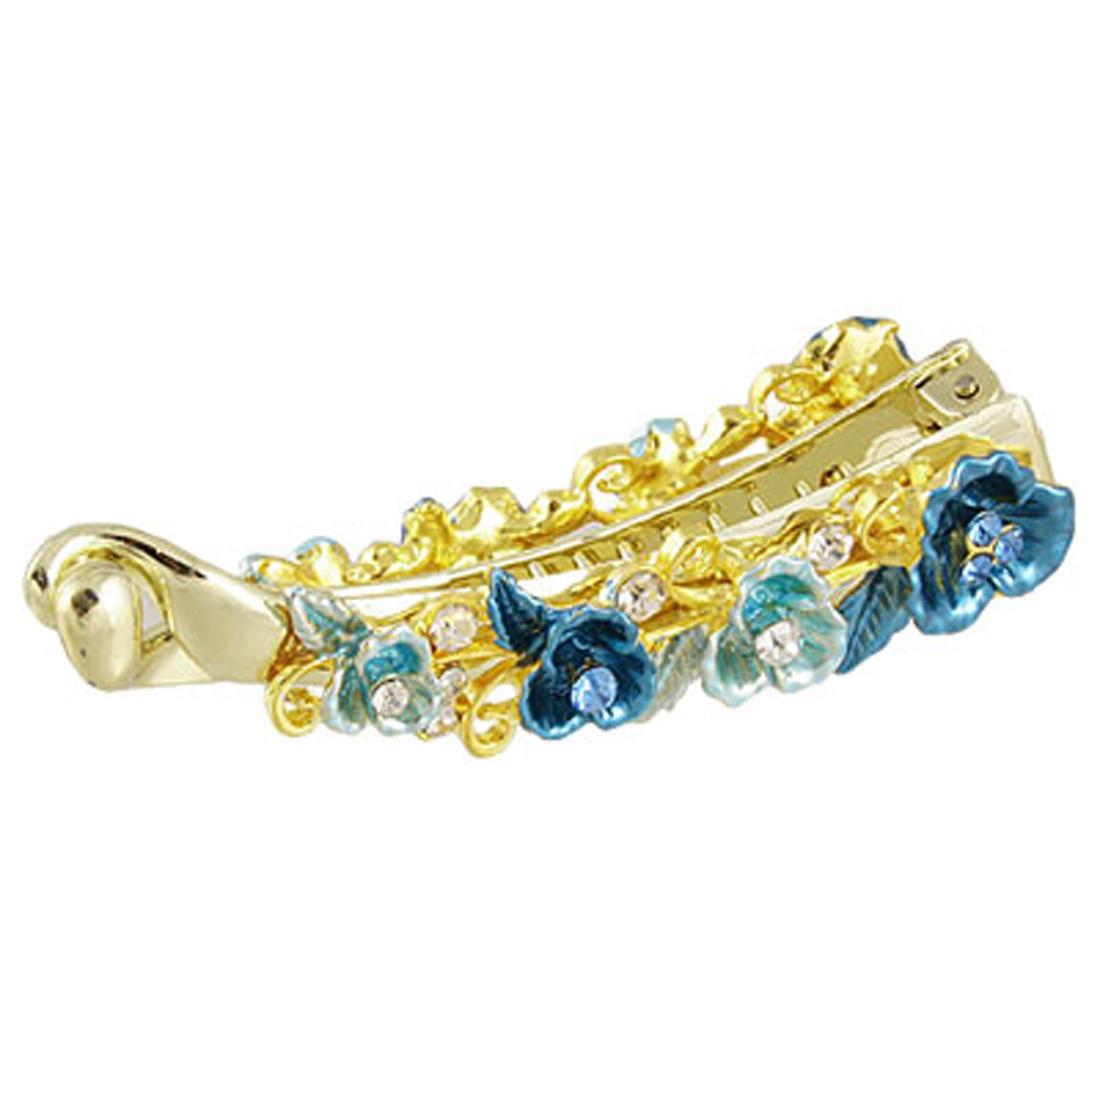 Glittery Rhinestone Accent Blue Floral Ponytail Banana Barrette